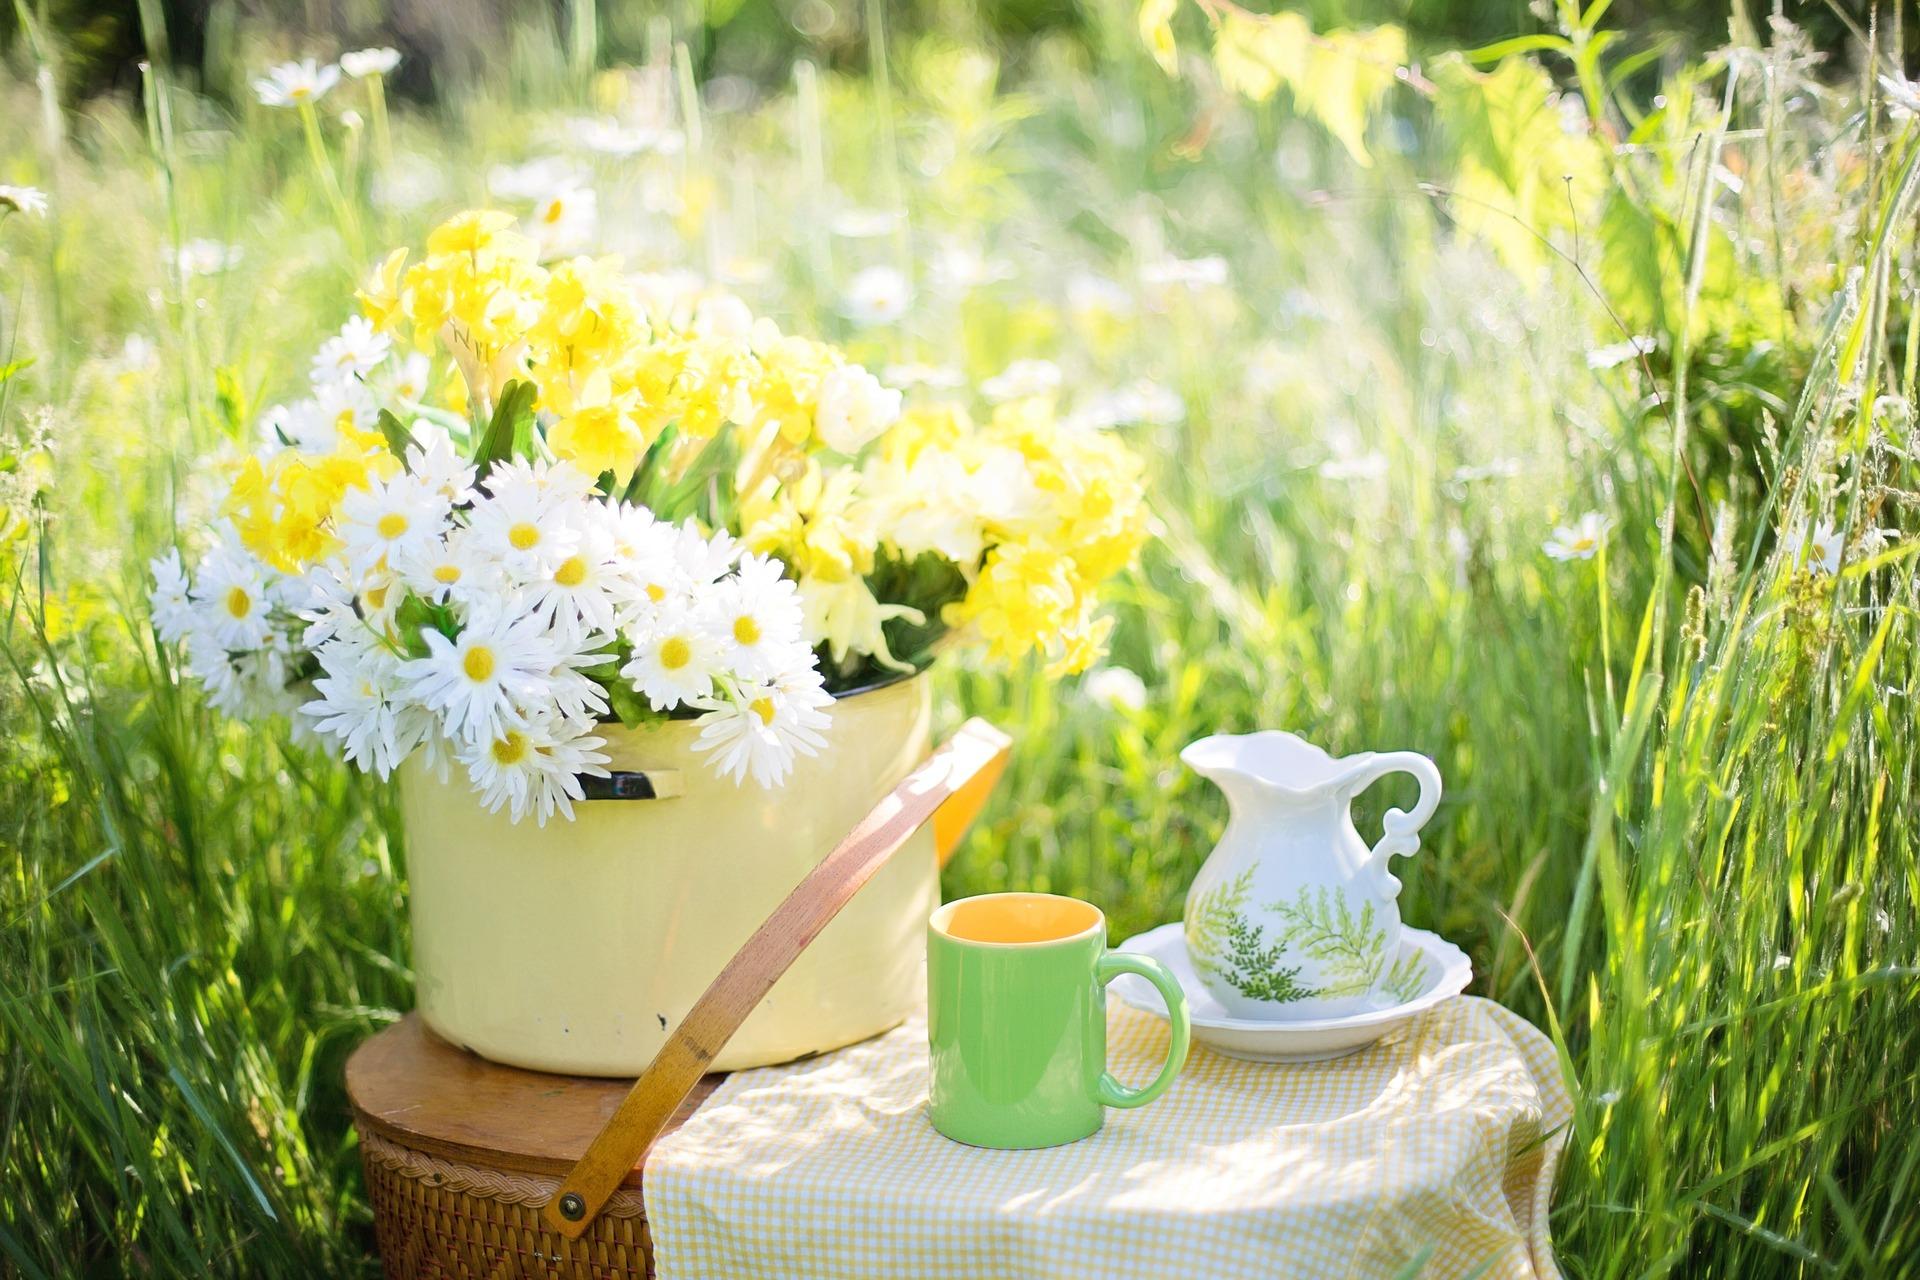 daisies-1466860_1920